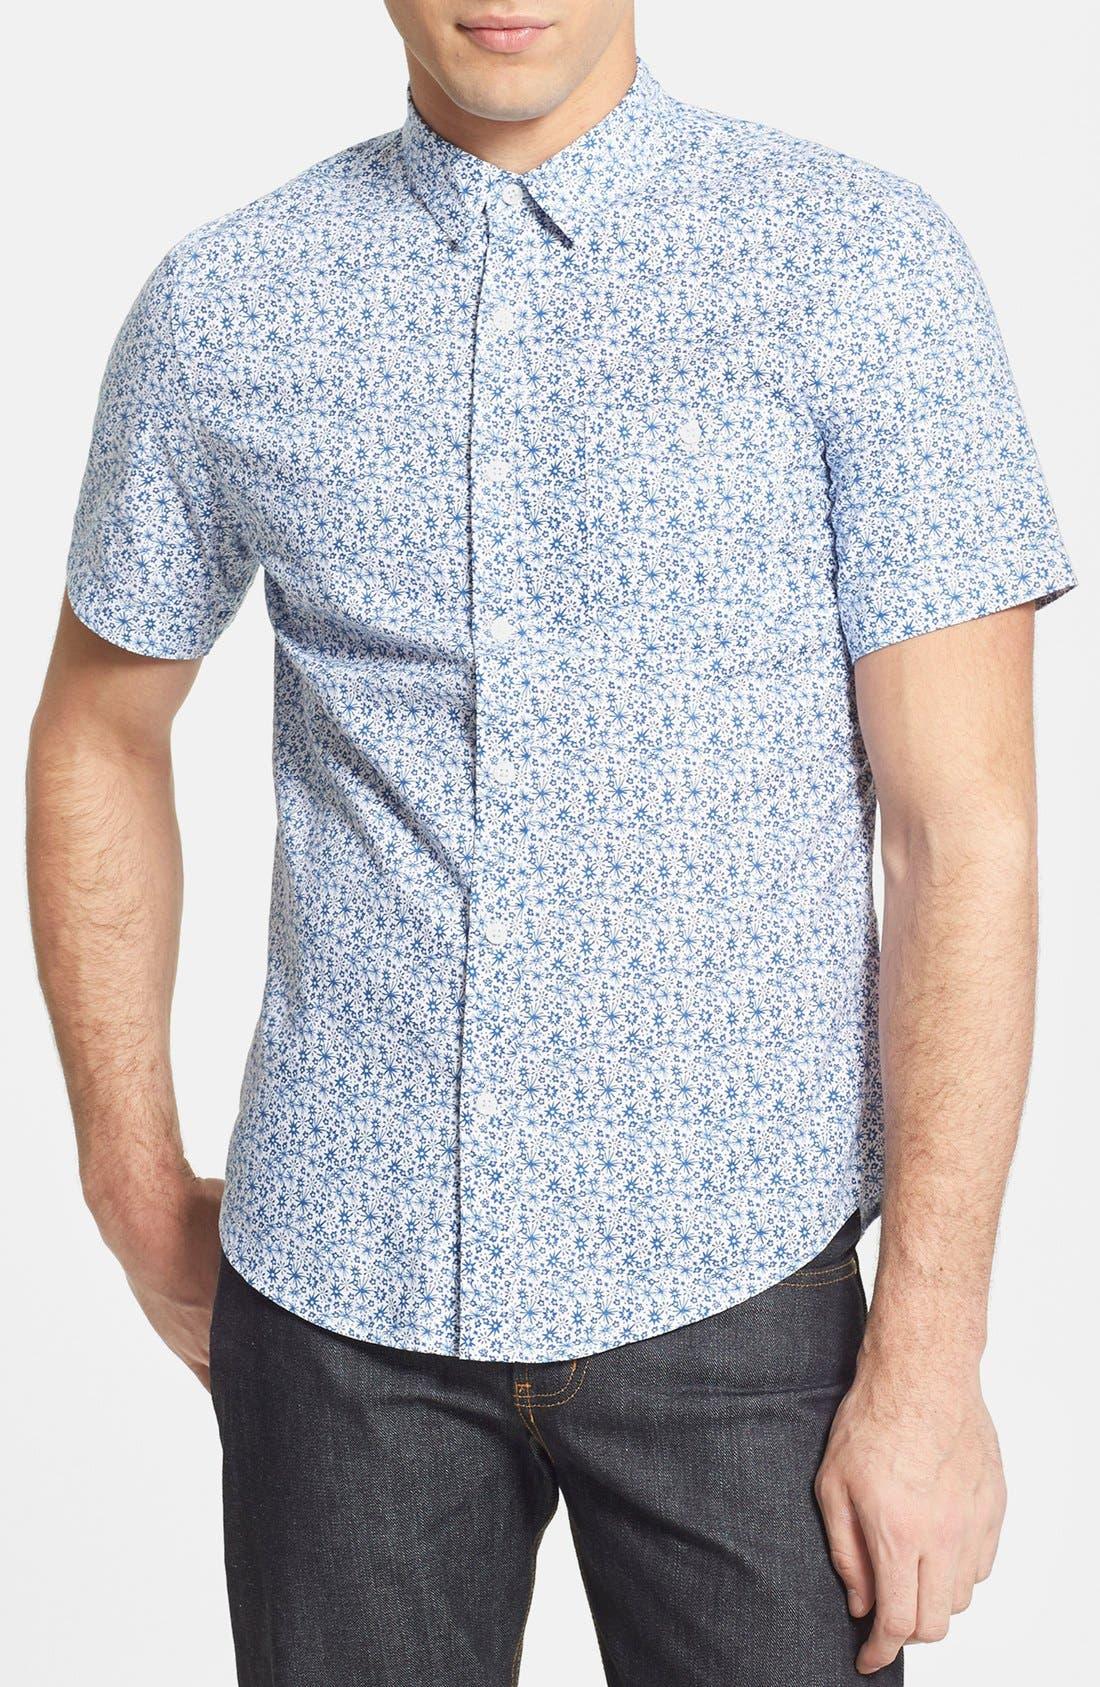 Alternate Image 1 Selected - Topman Slim Fit Short Sleeve Ditsy Floral Print Shirt